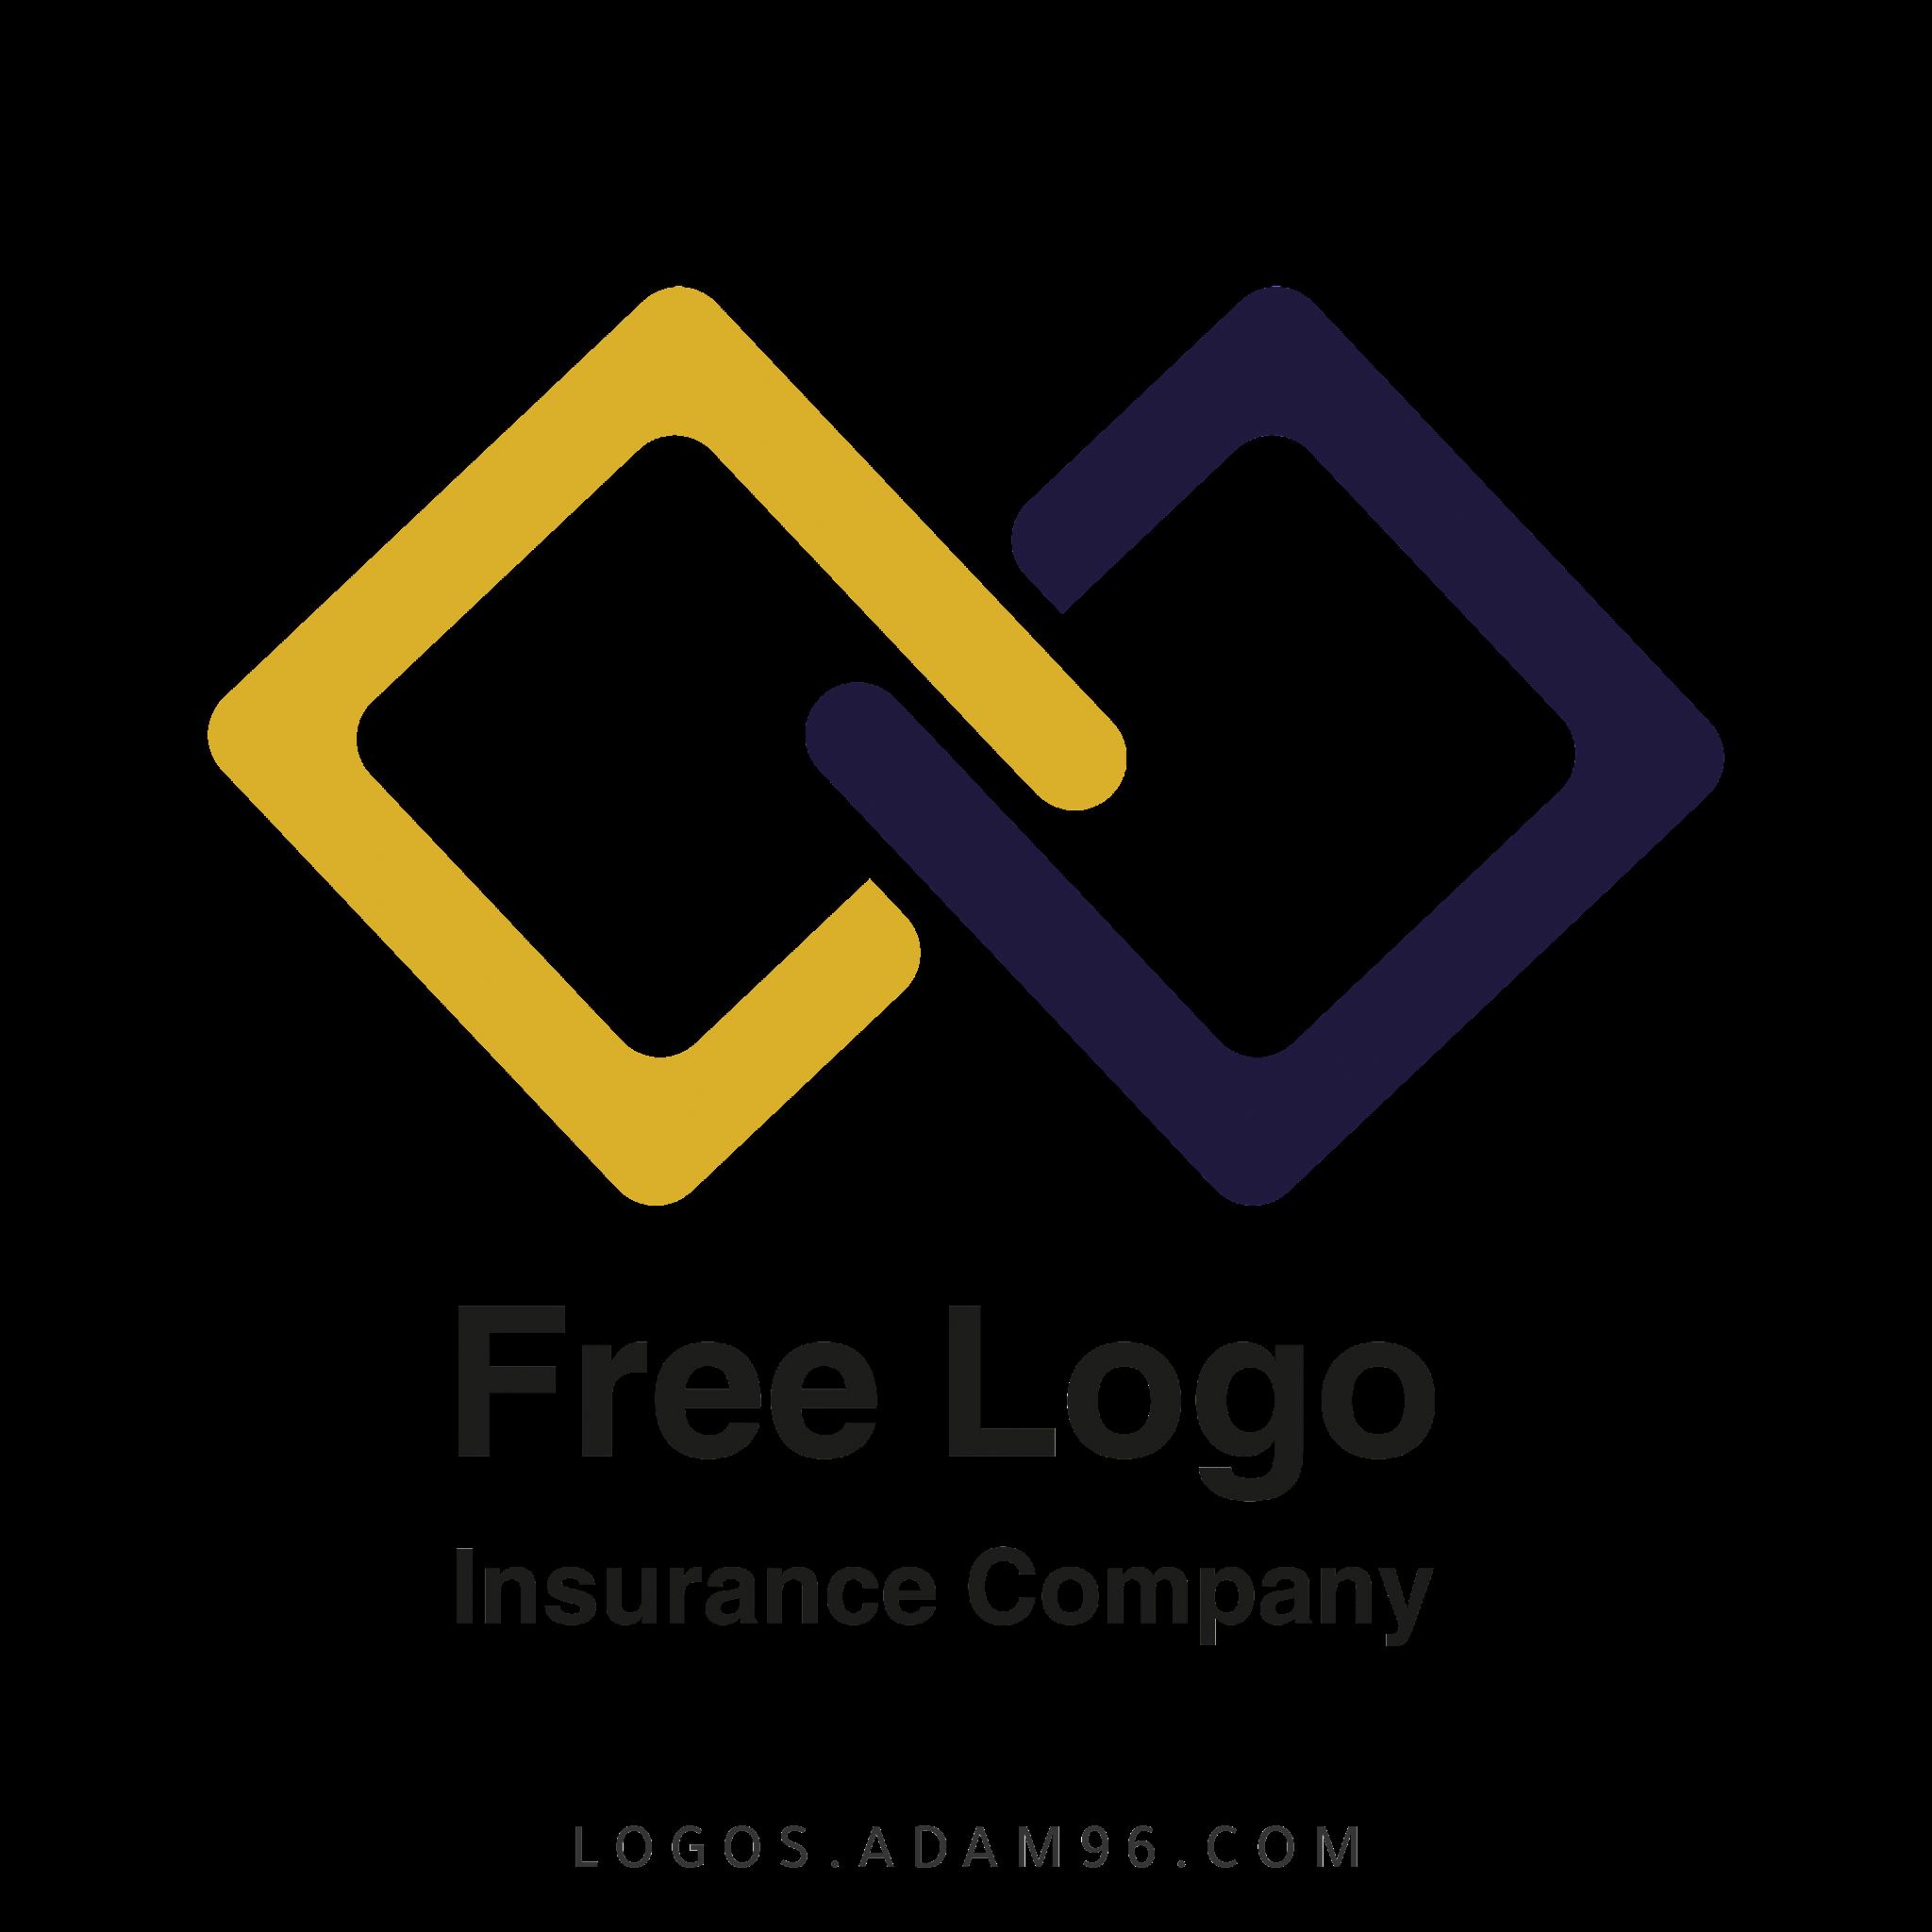 Download Free Logo Insurance Company Vectors PDF - AI - SVG - PNG